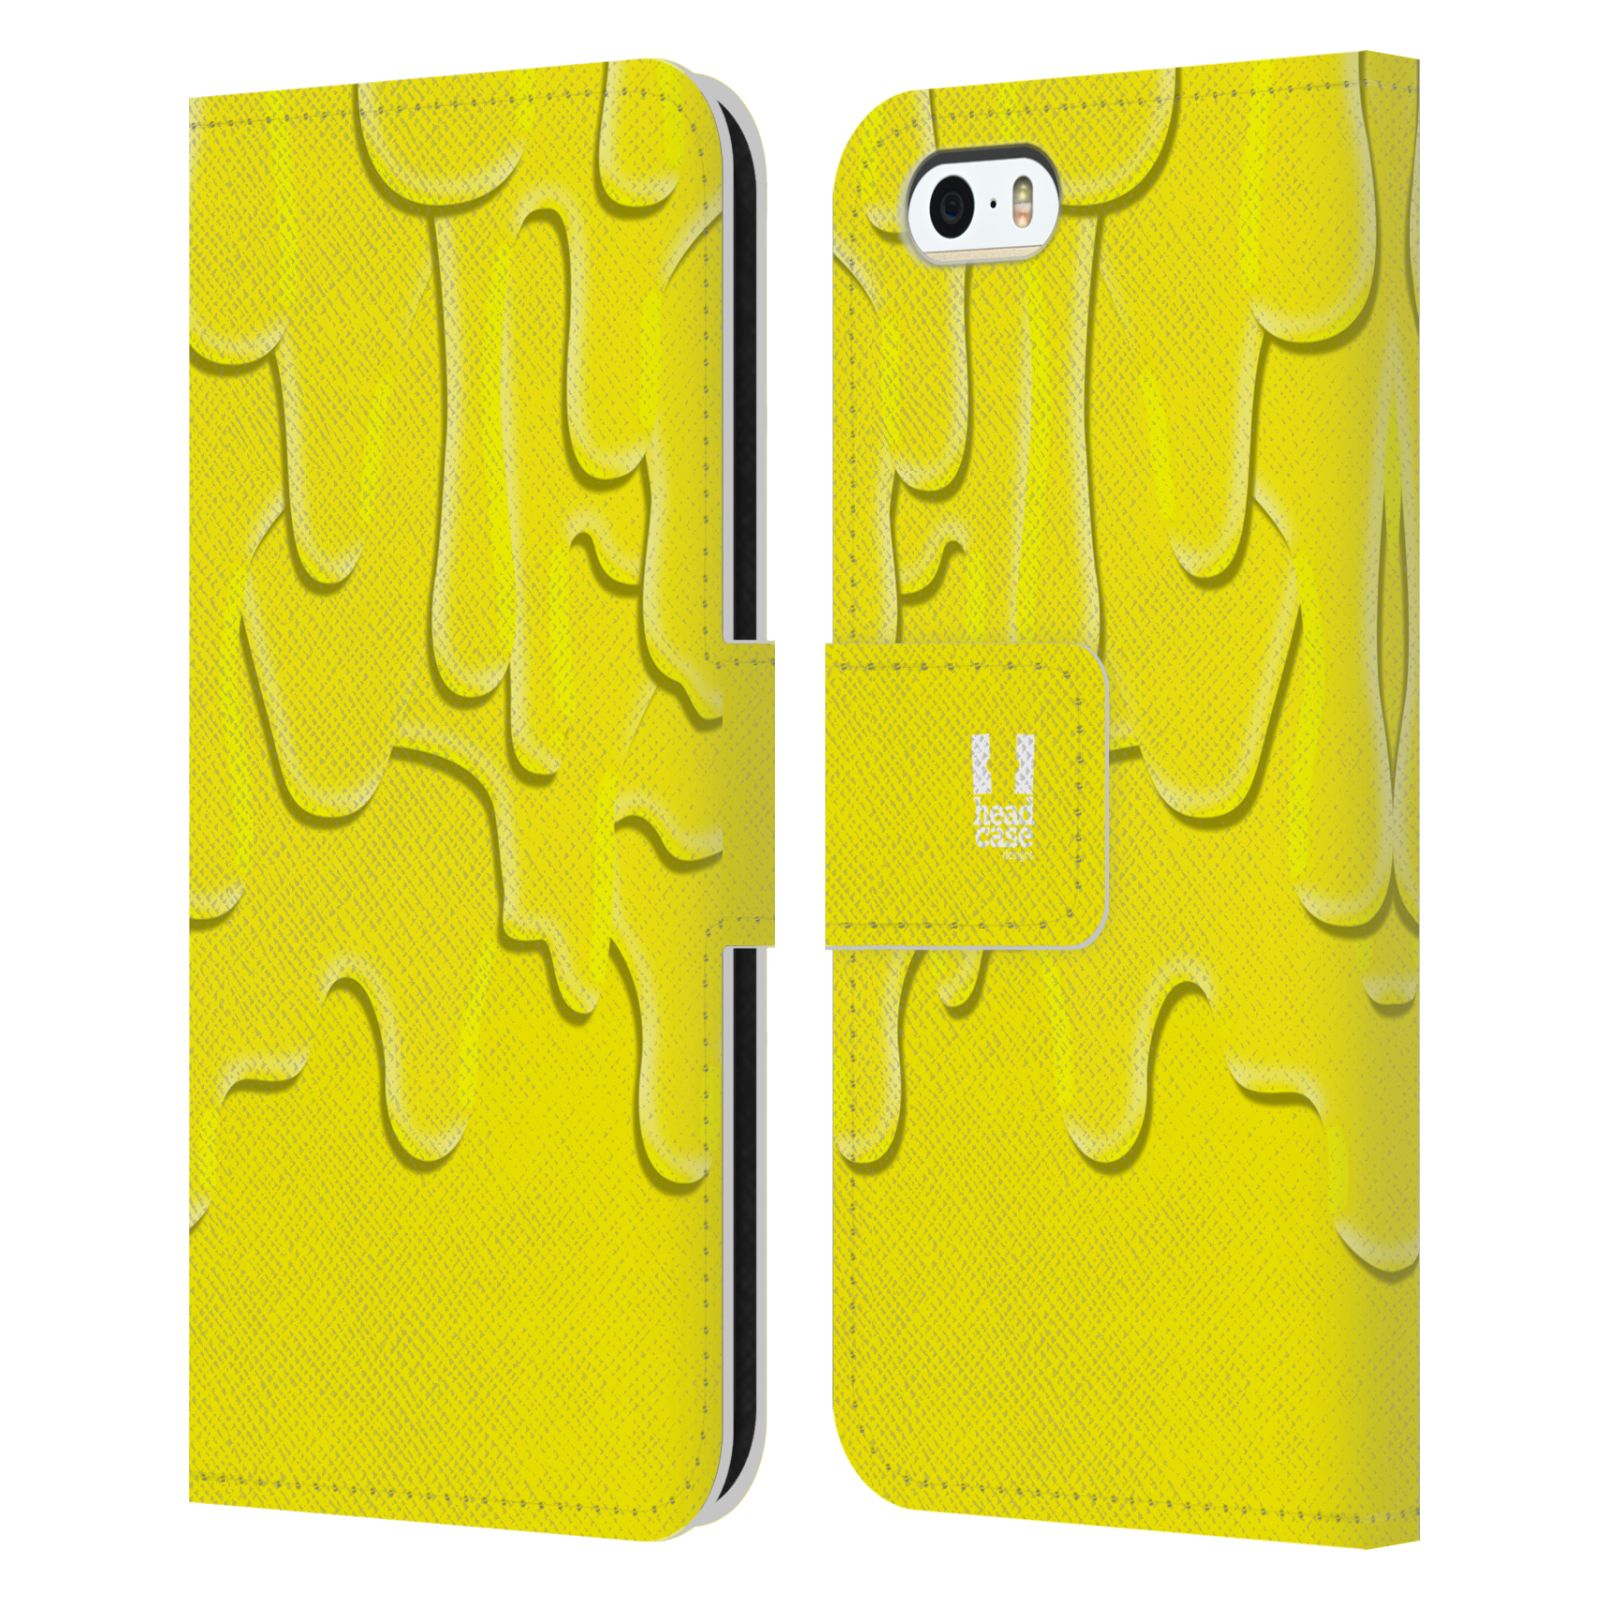 HEAD CASE Flipové pouzdro pro mobil Apple Iphone 5/5s ZÁPLAVA BARVA žlutá